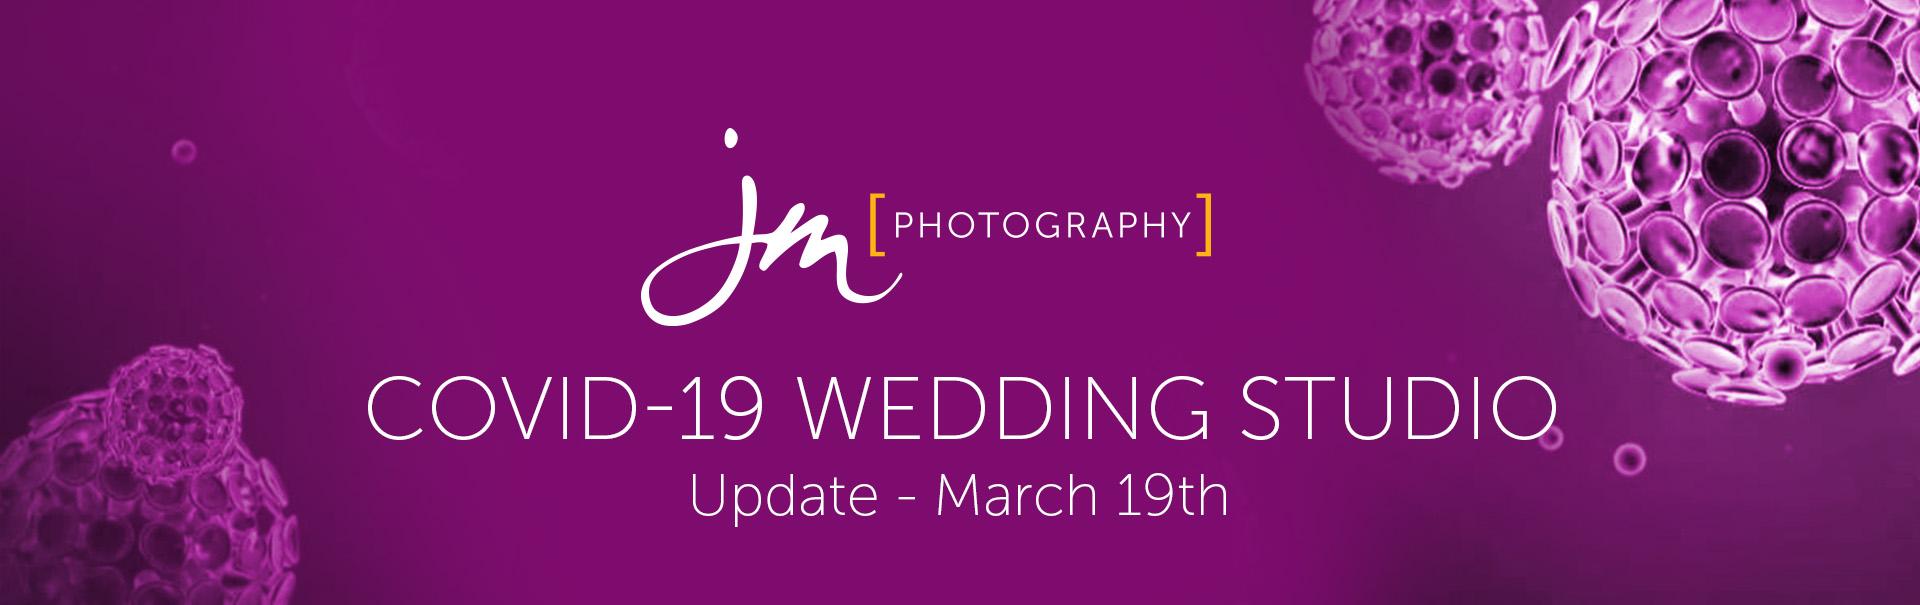 covid-19-coronavirus-jm_photography-wedding-studio-update-20200319